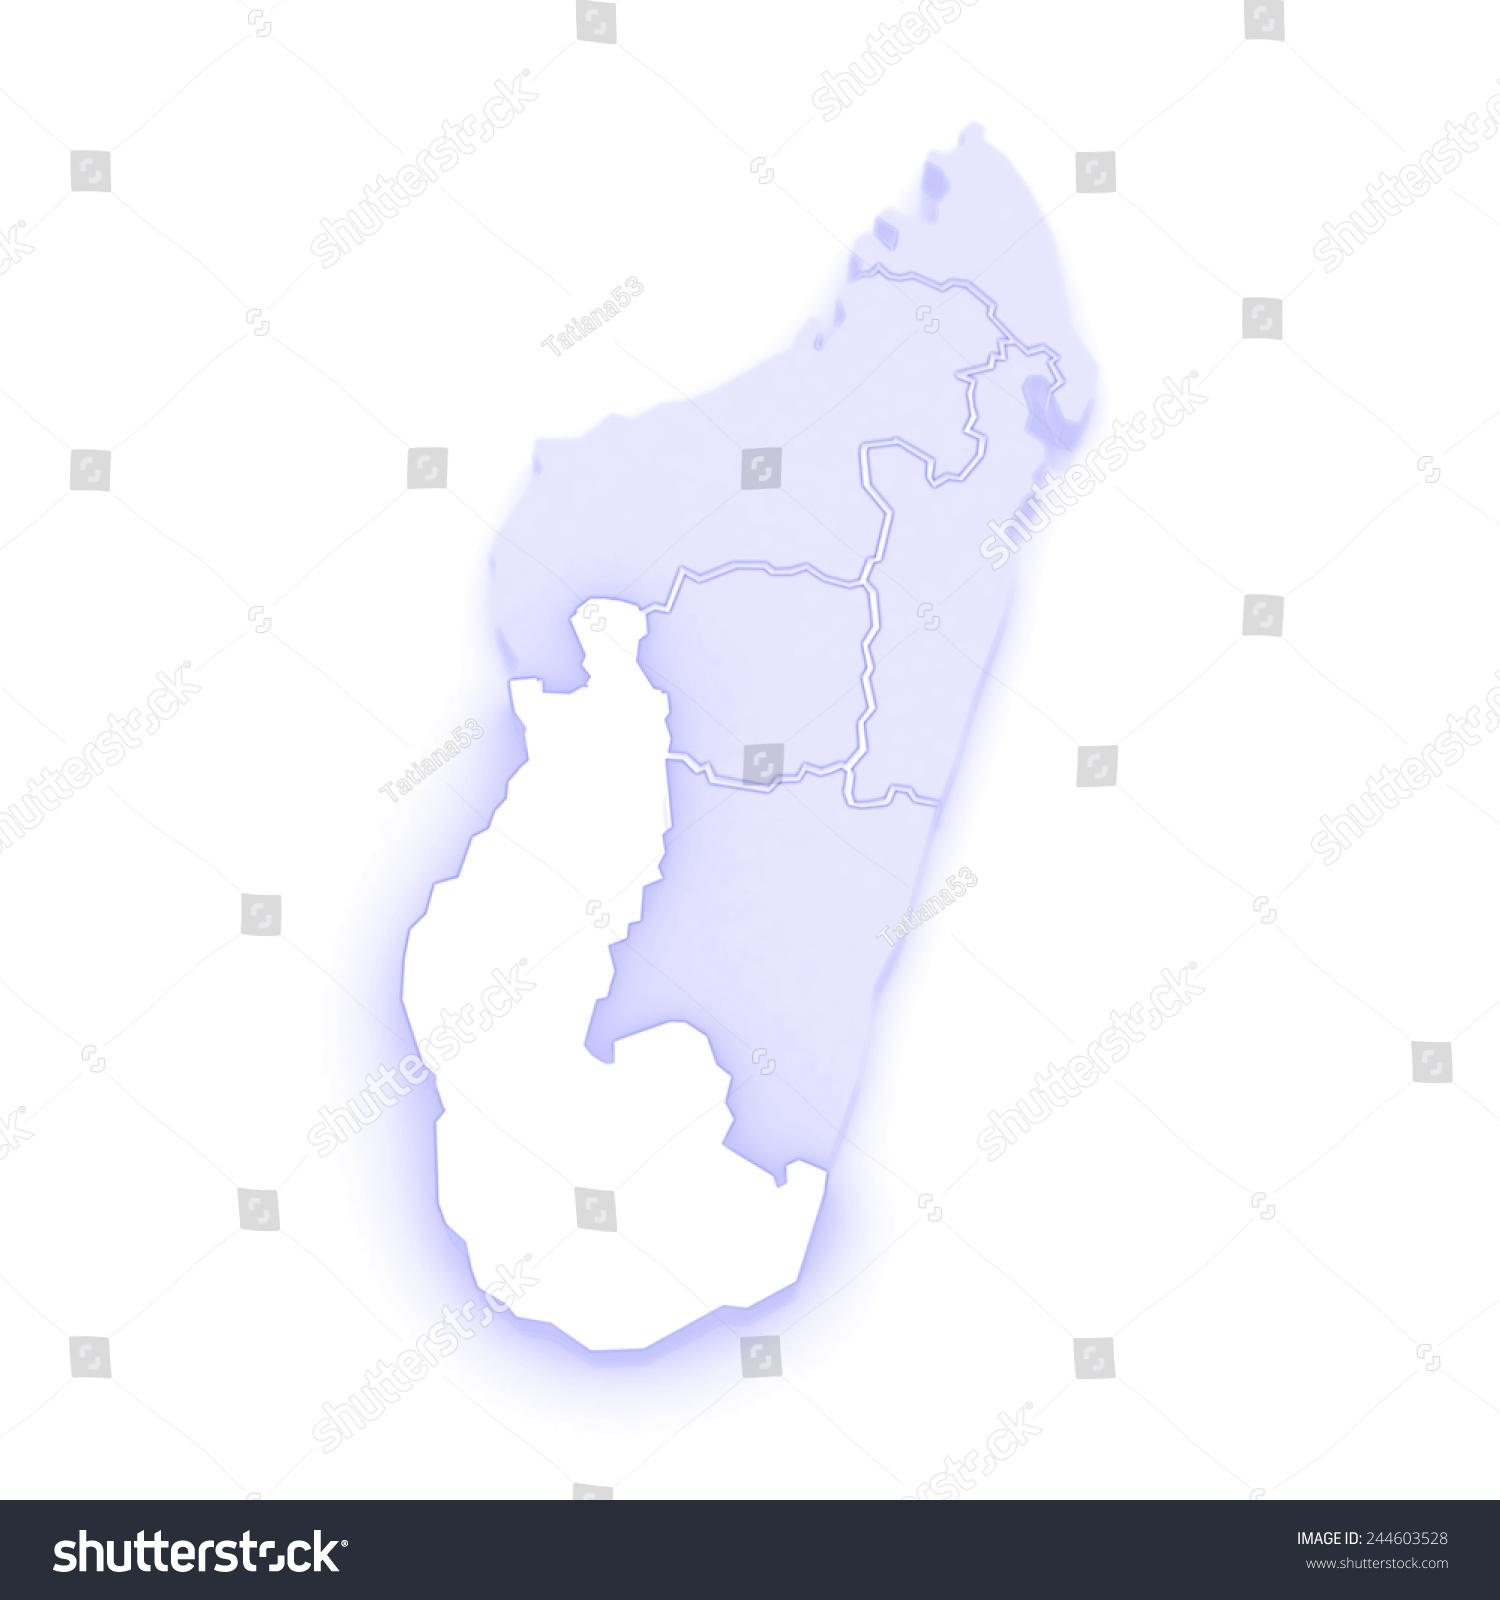 Map Toliara Madagascar 3 D Stock Illustration 244603528 - Shutterstock